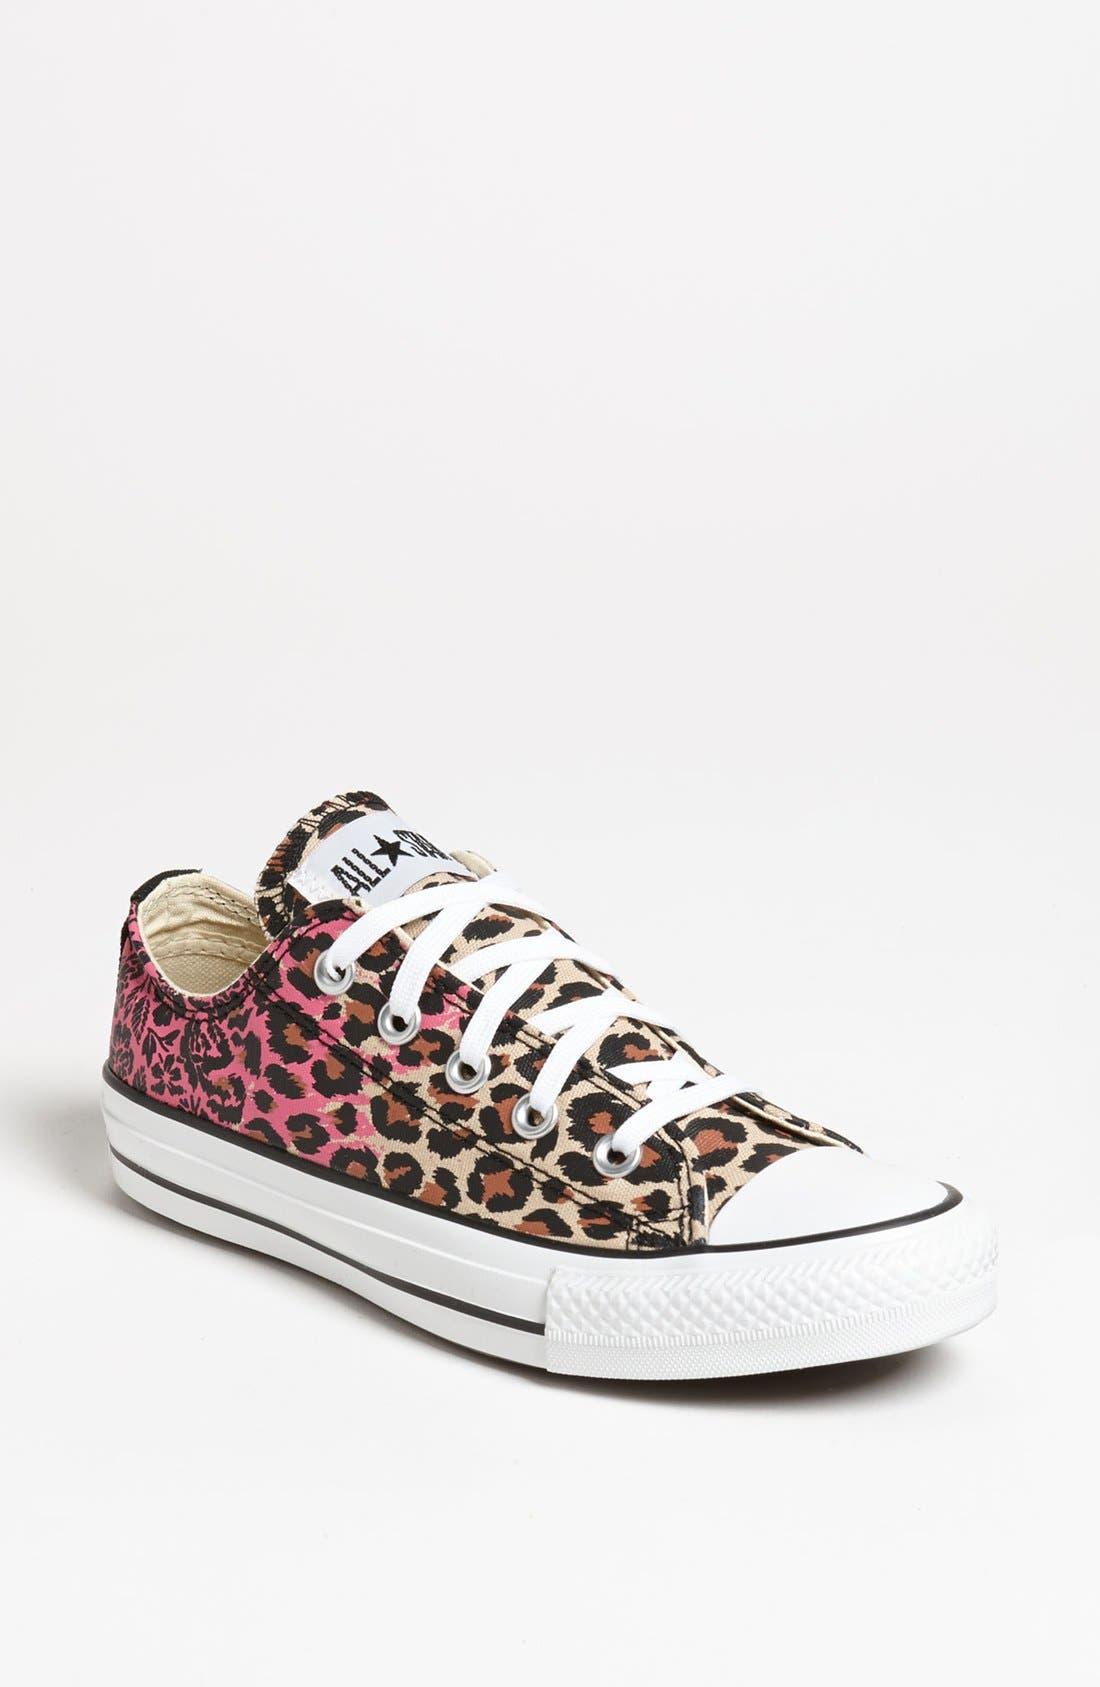 Main Image - Converse Chuck Taylor® All Star® Animal Print Sneaker (Women)